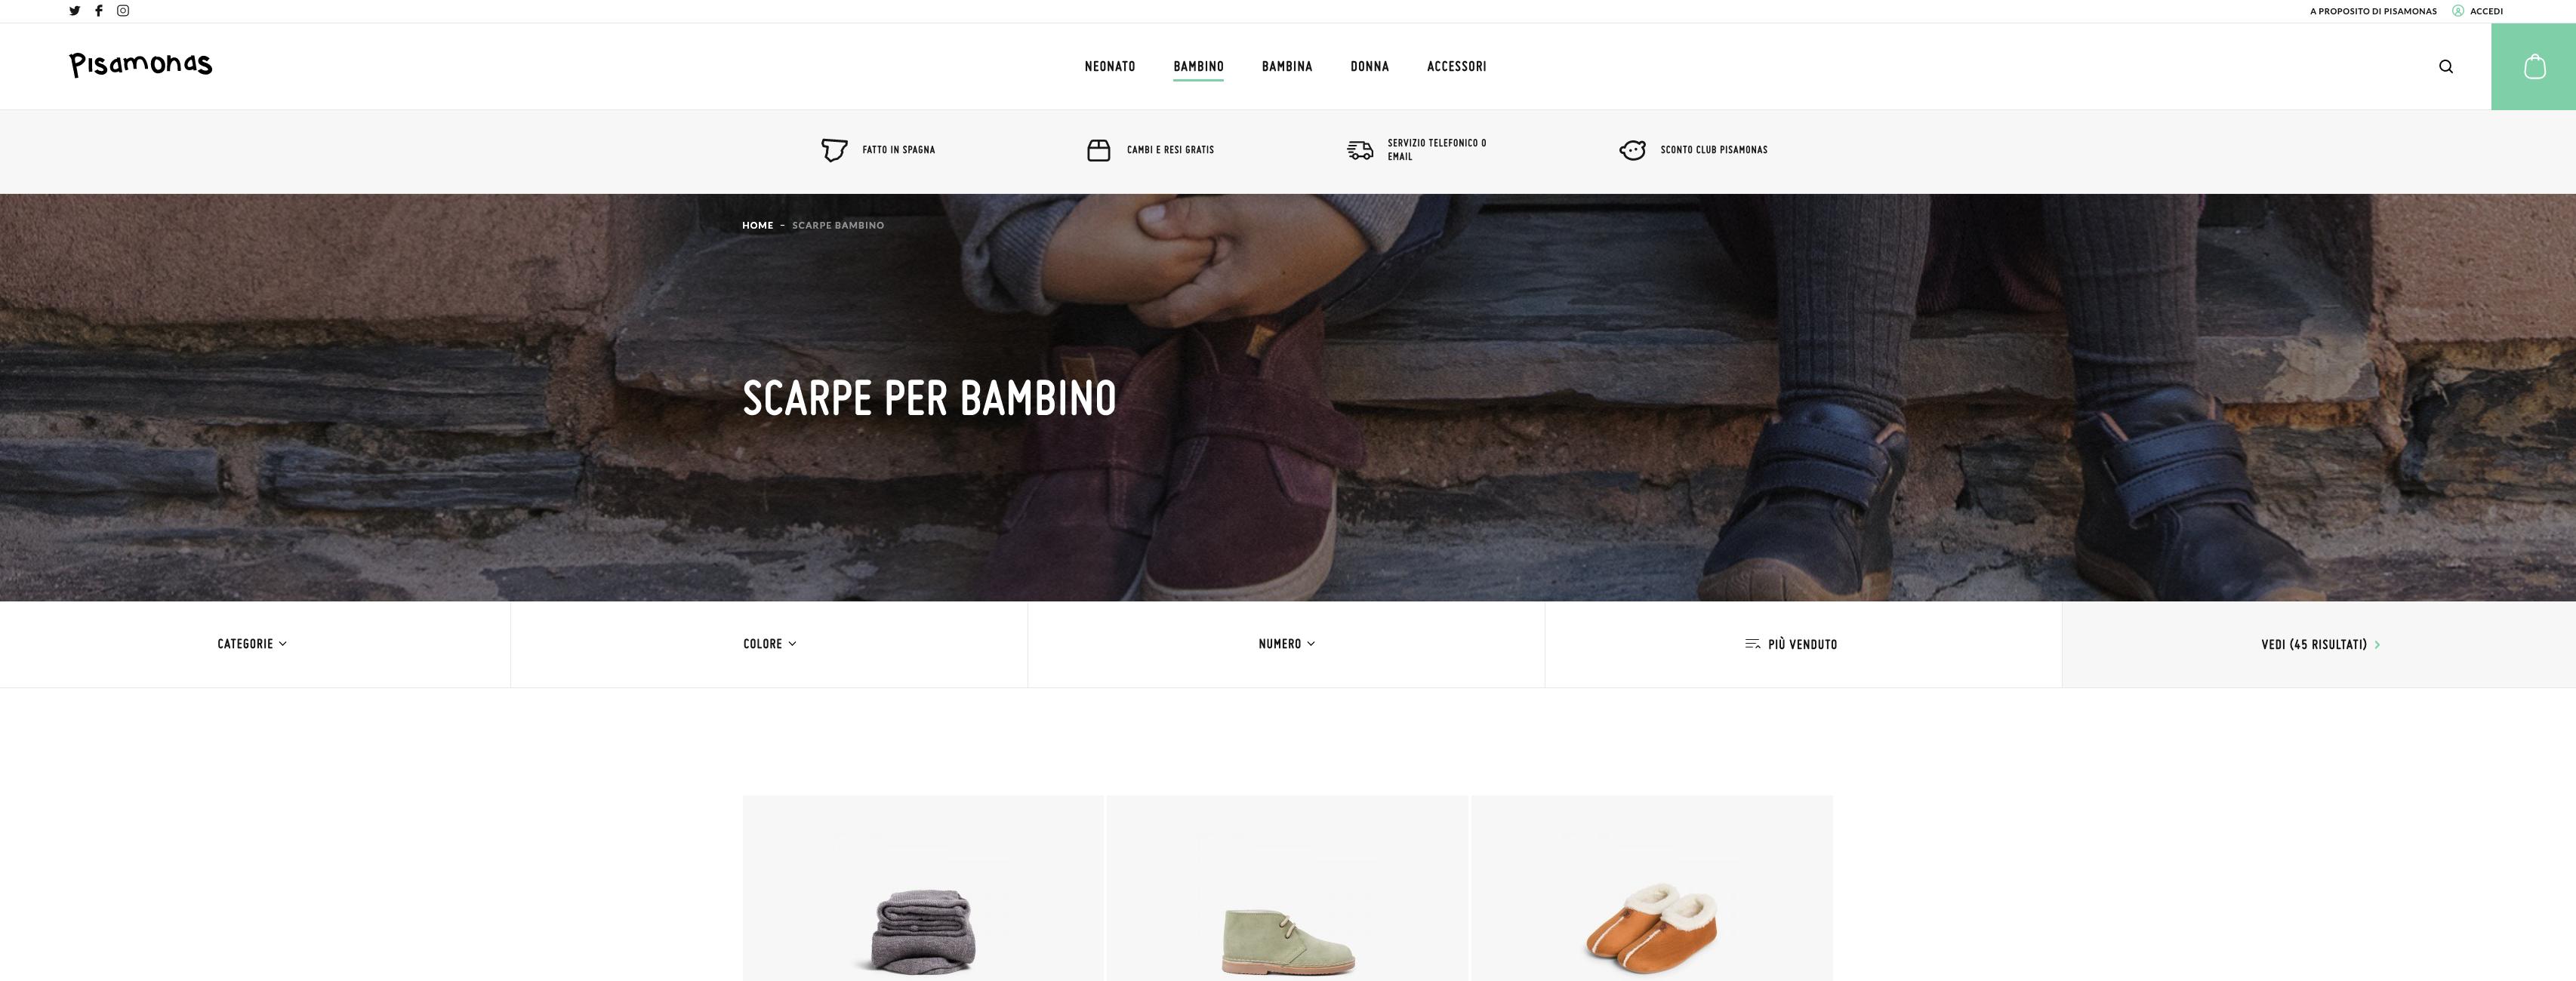 Pisamonas scarpe bambini online